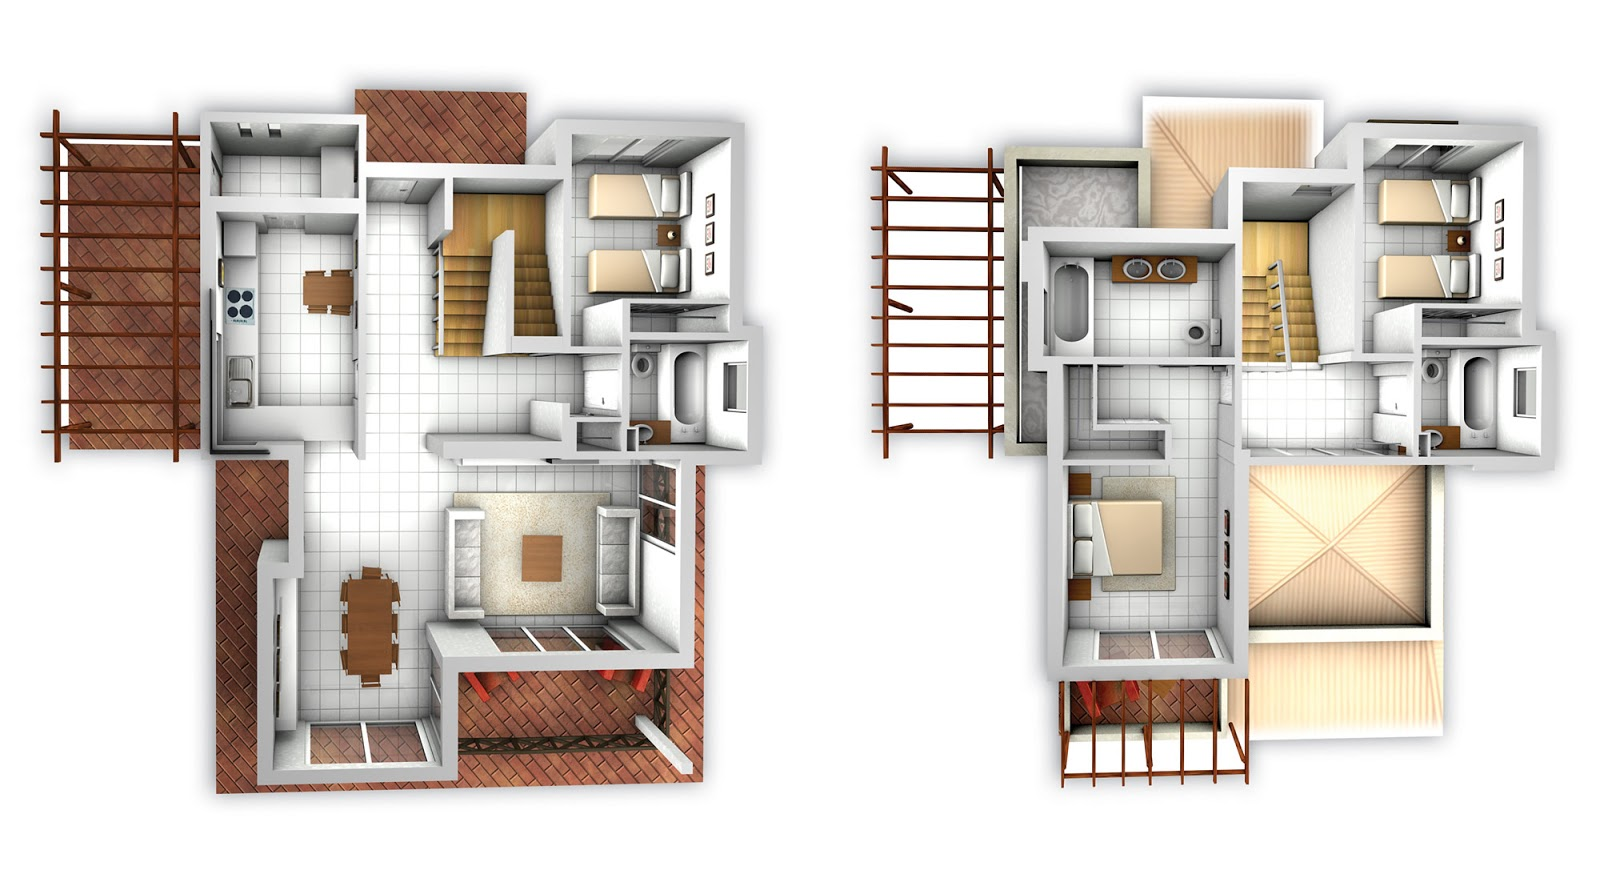 Foundation dezin decor residential layouts 3d view for Plan villa 3d